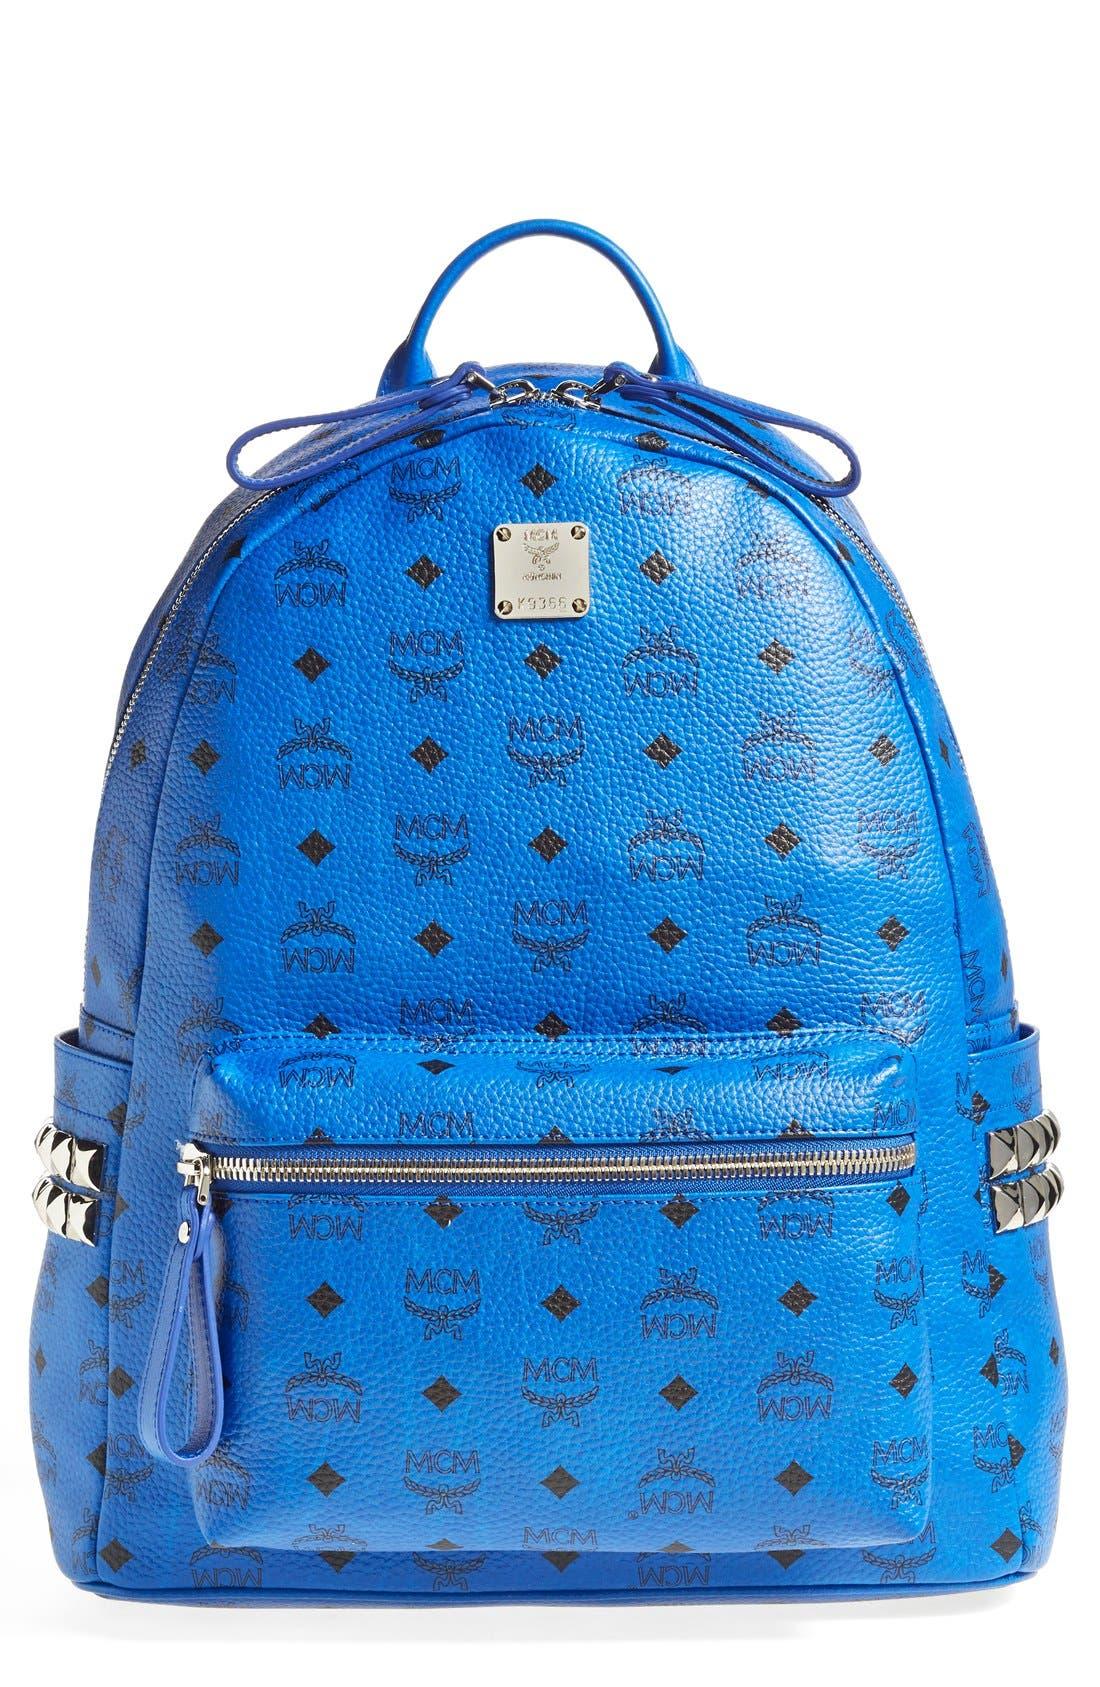 Alternate Image 1 Selected - MCM 'Medium Visetos' Coated Canvas Backpack